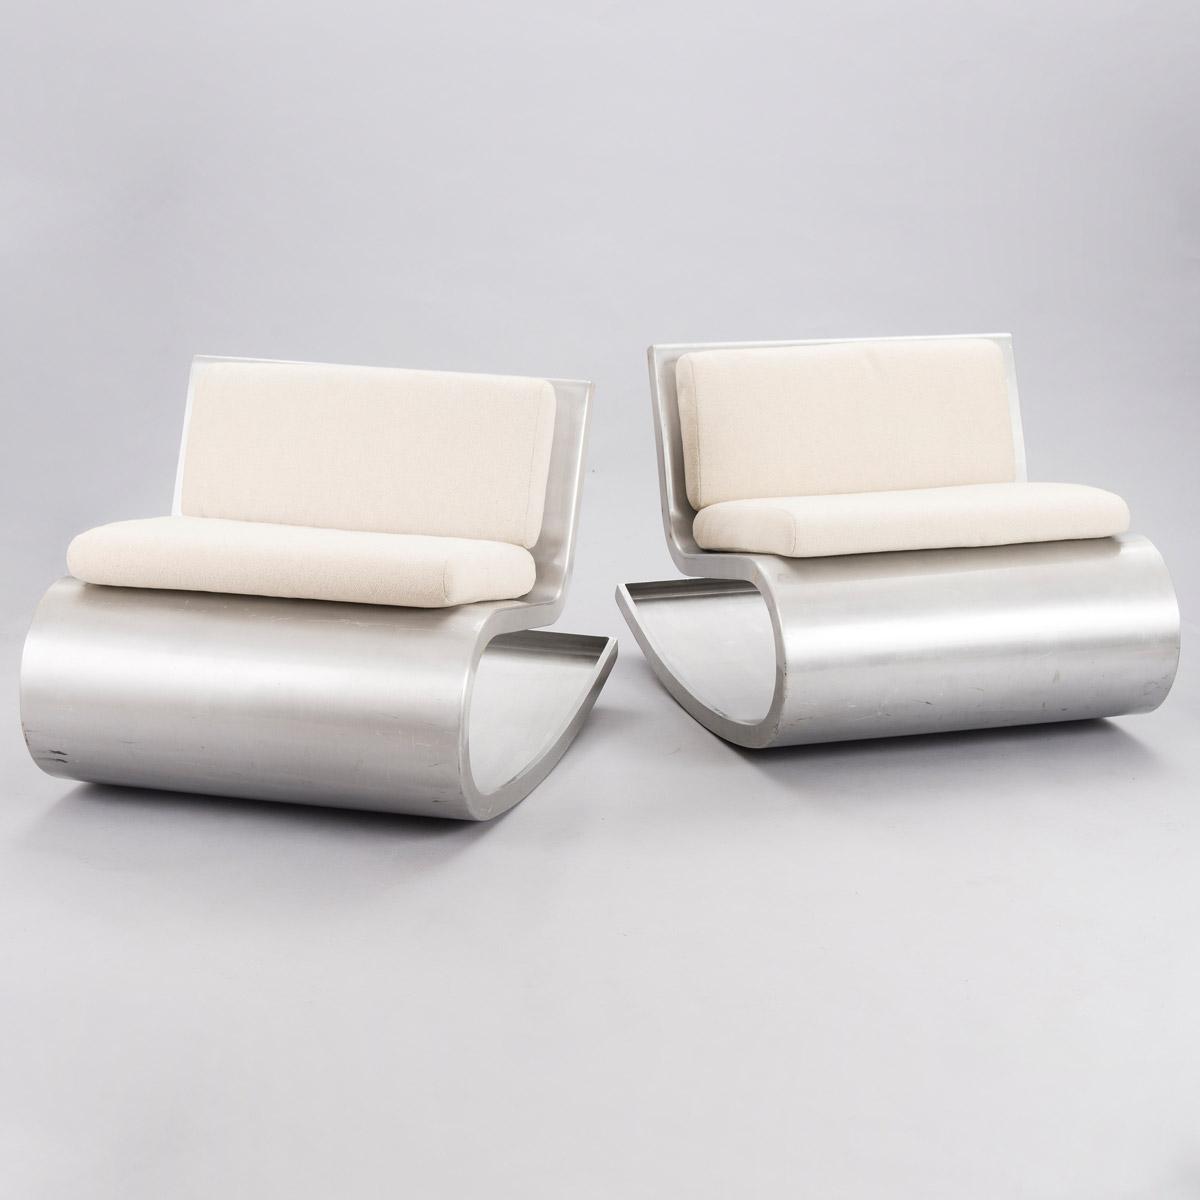 Aluminum chairs with cushions by Petra Majantie ja Siri Viherheimo.